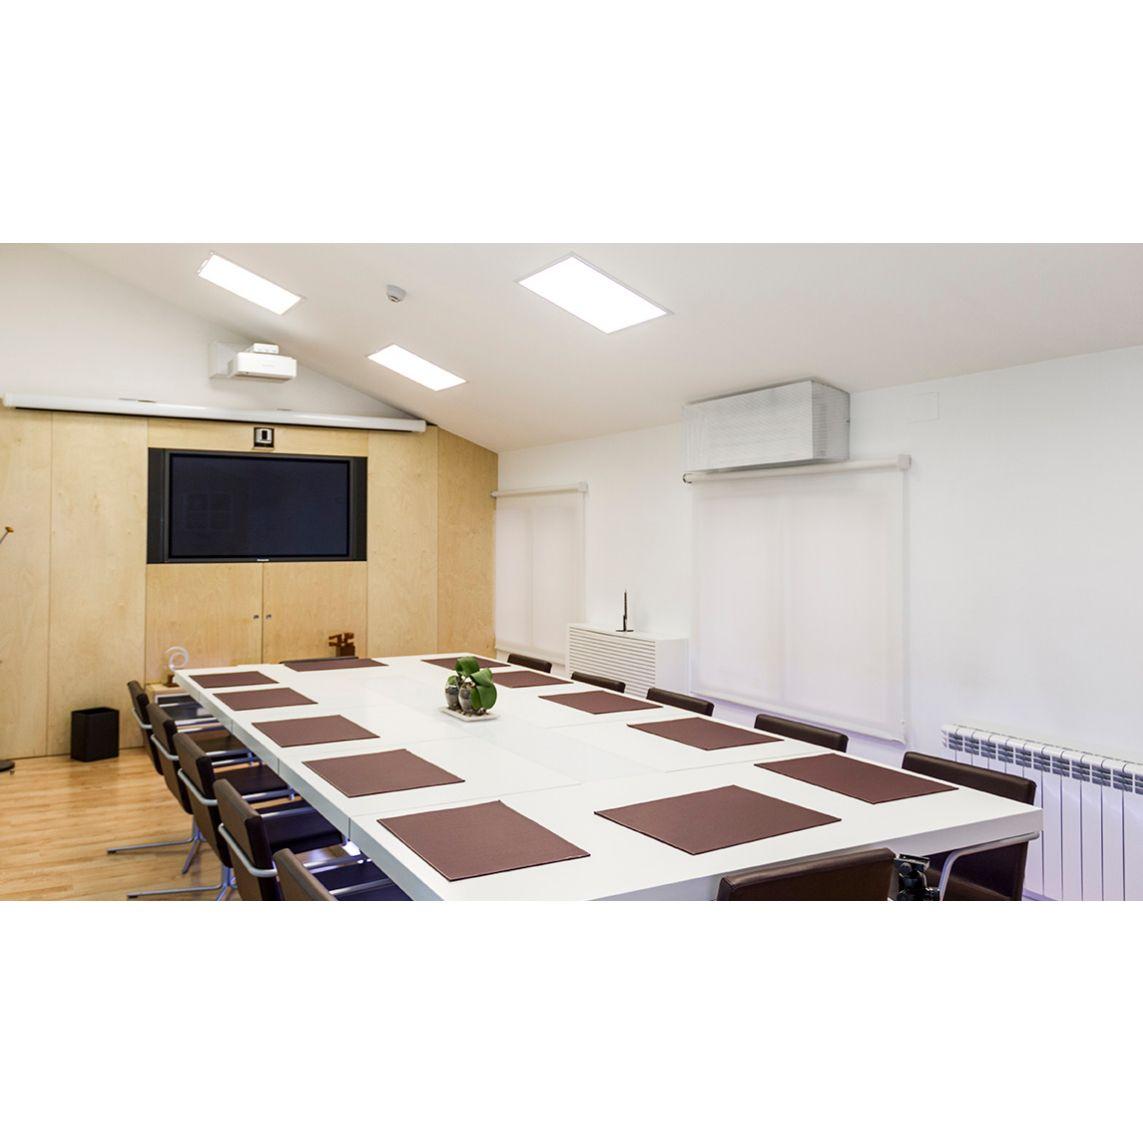 Mobiliario de oficina a medida proyectos y obras for Mobiliario modular para oficina